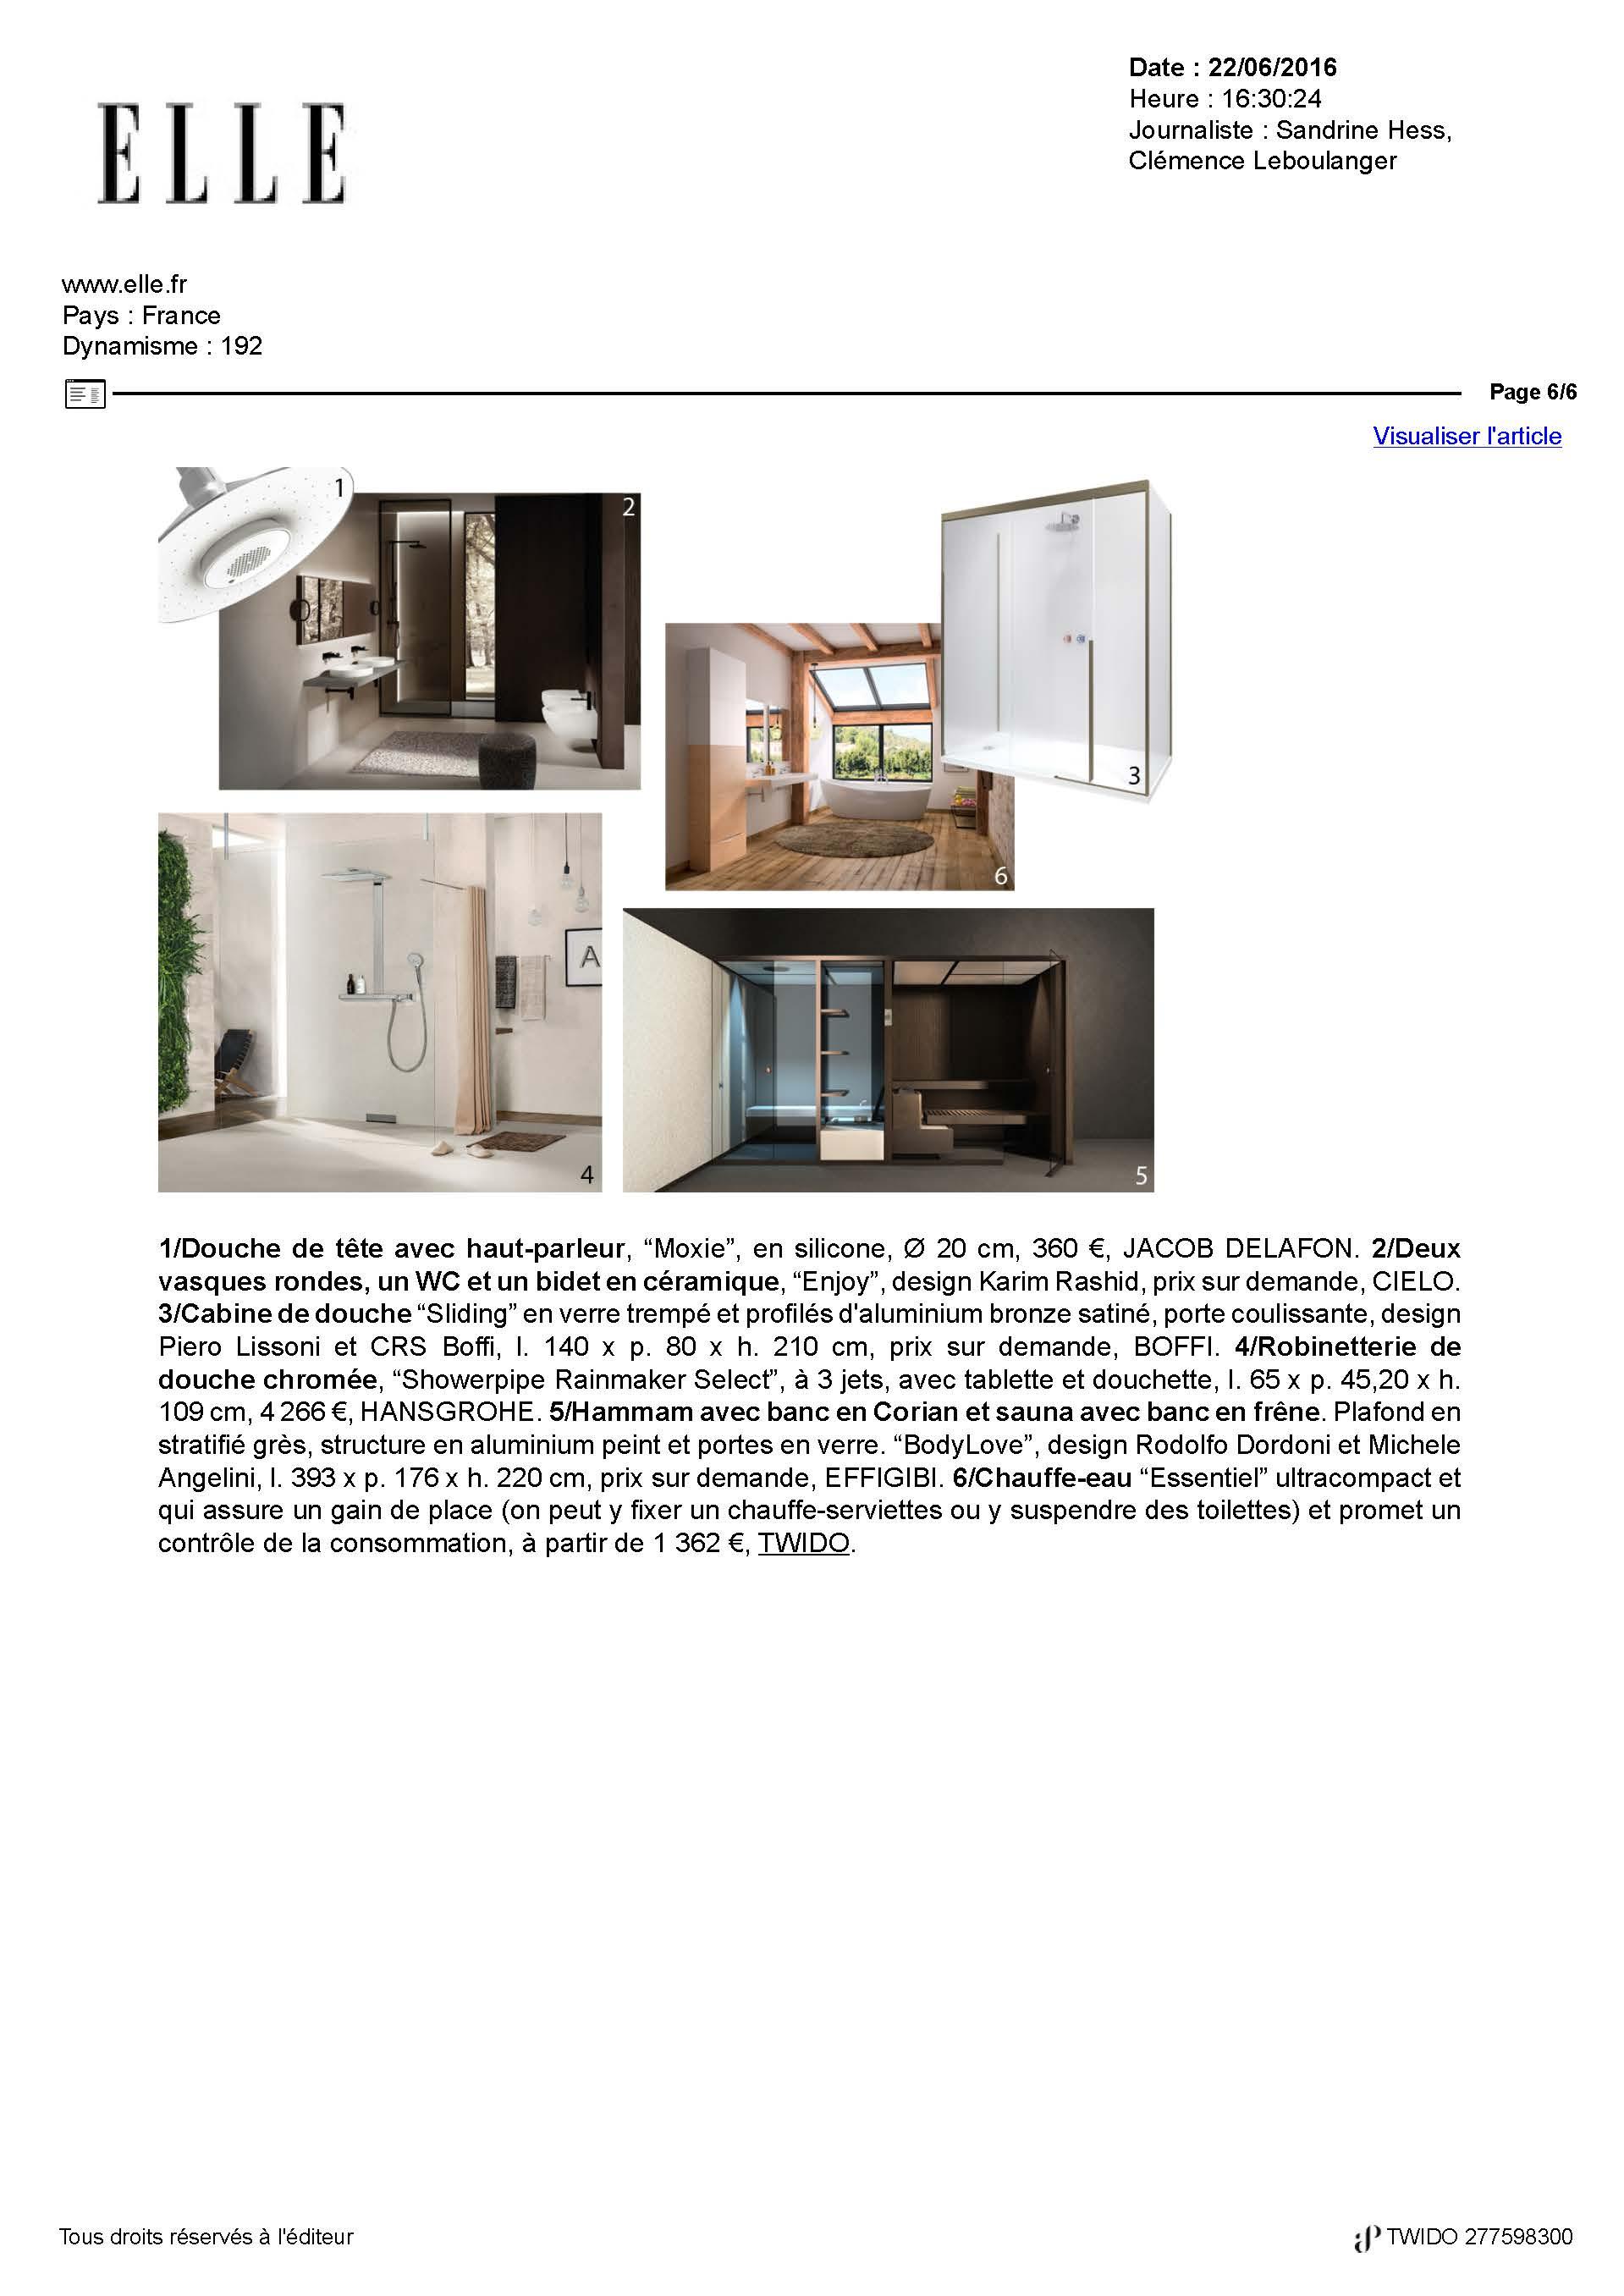 Collection Essentiel Twido sur ELLE magasine